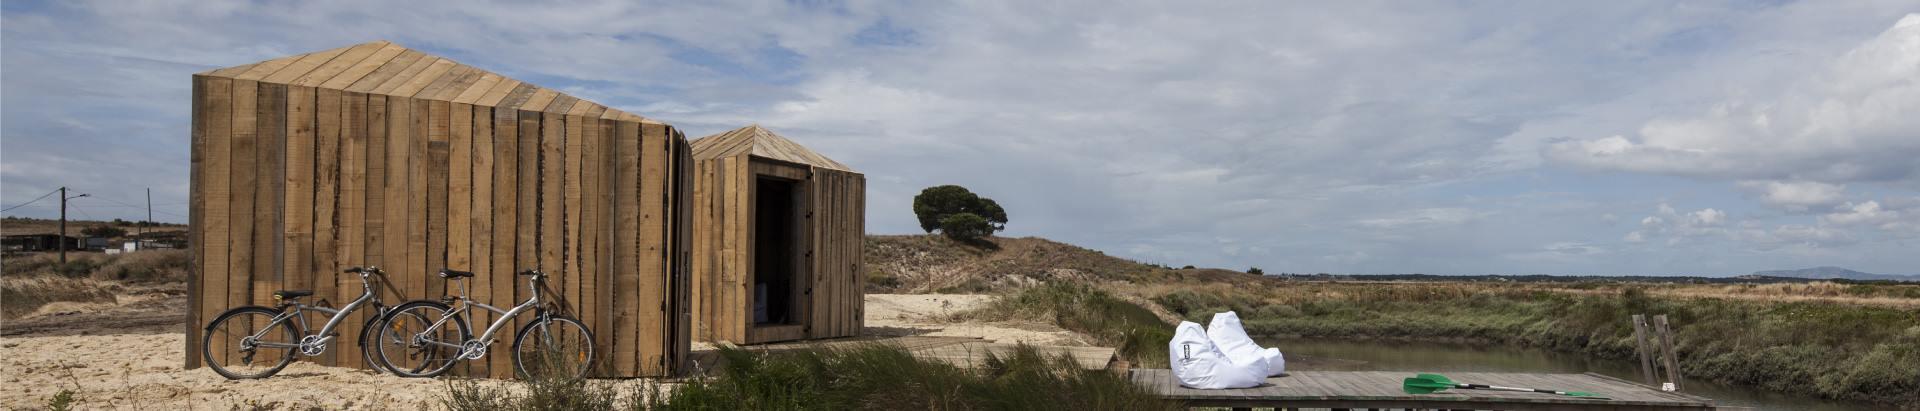 cabane-de-pecheur-revisitee-cabanasnorio-8